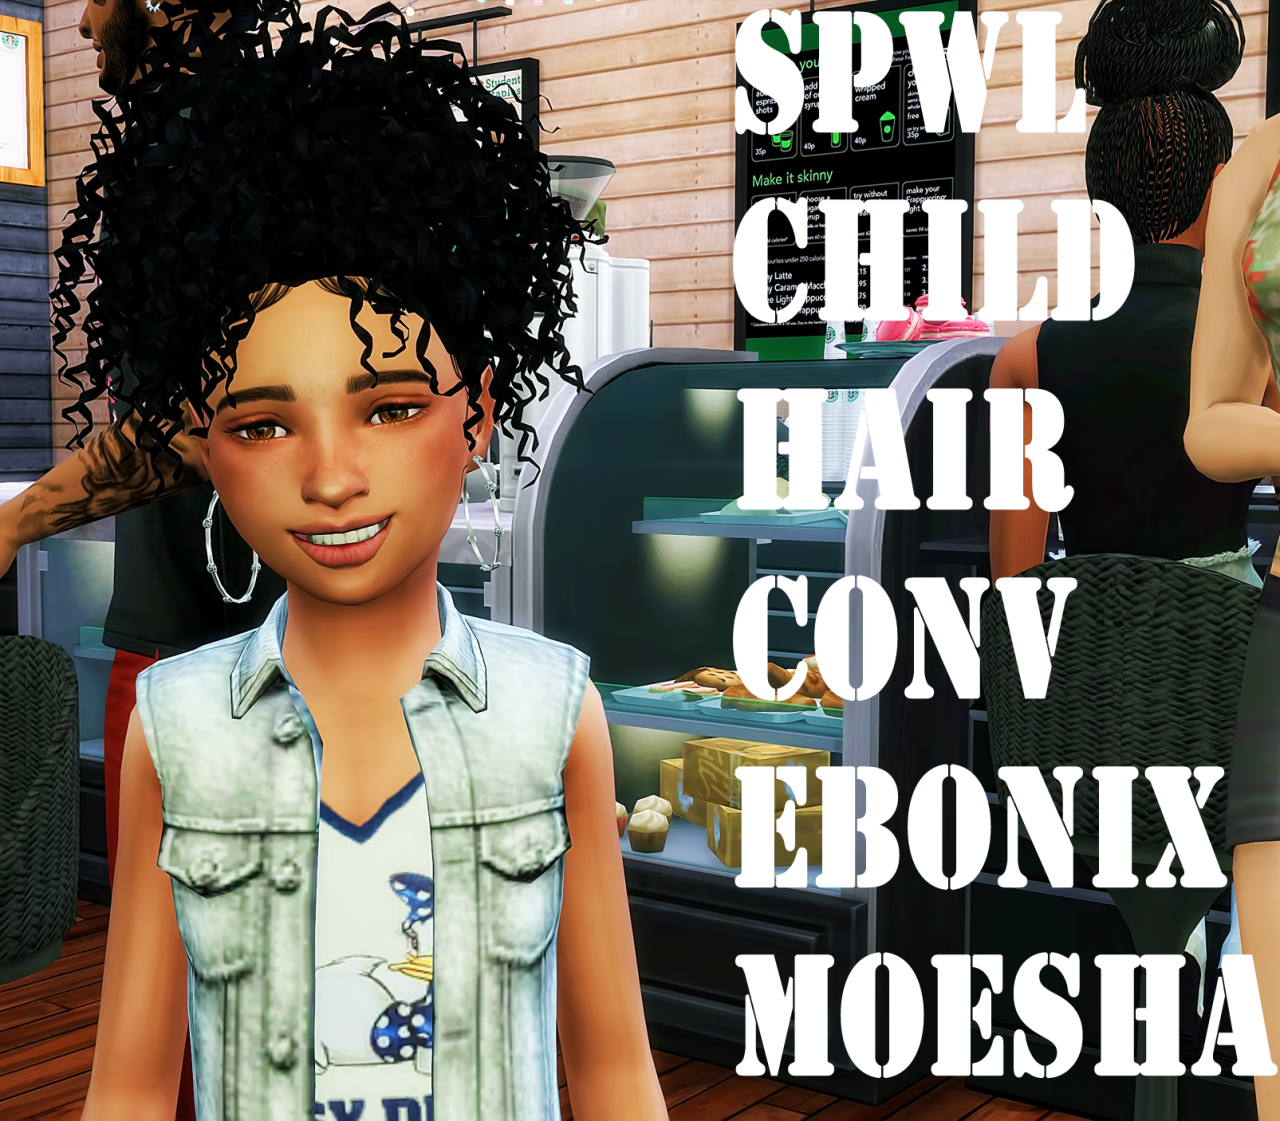 Lana Cc Finds Spwl Cf Ebonix Moesha Hair Sims 4 Curly Hair Sims Hair Toddler Hair Sims 4